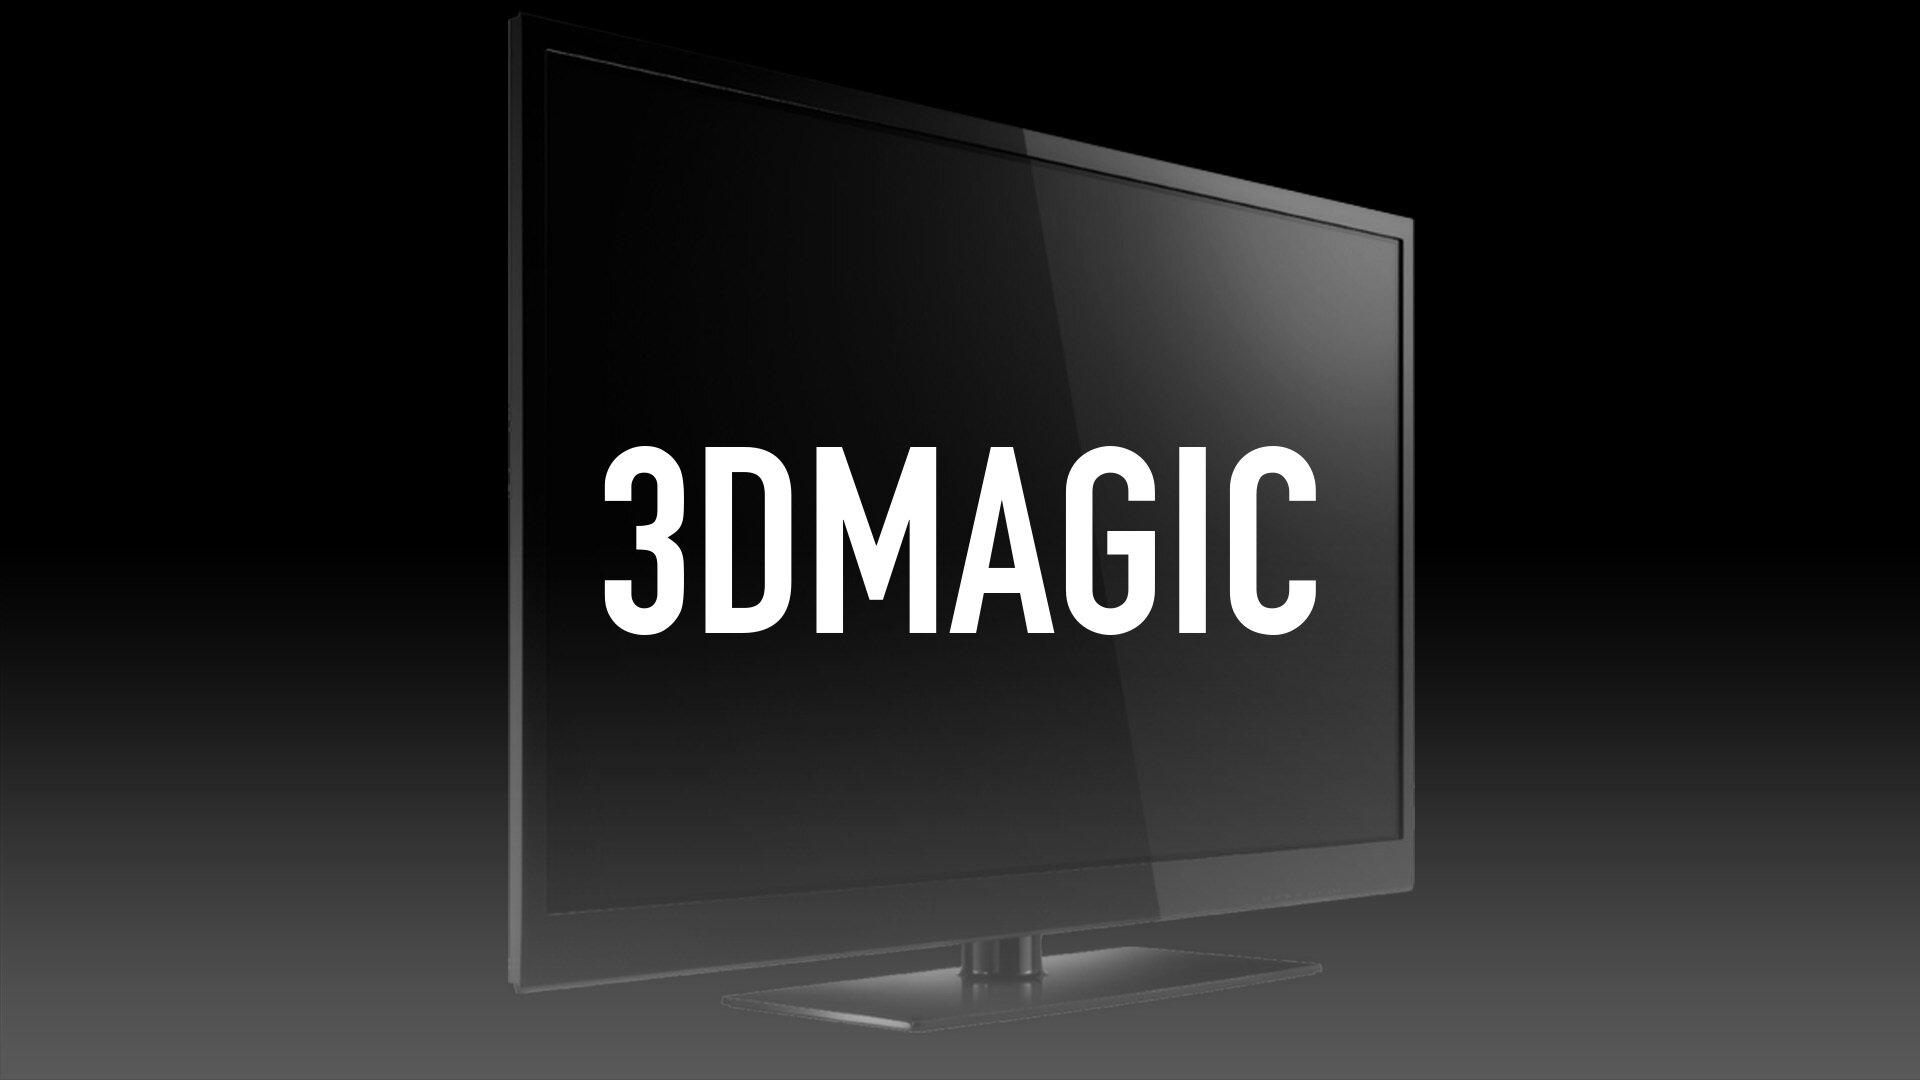 3Dmagic